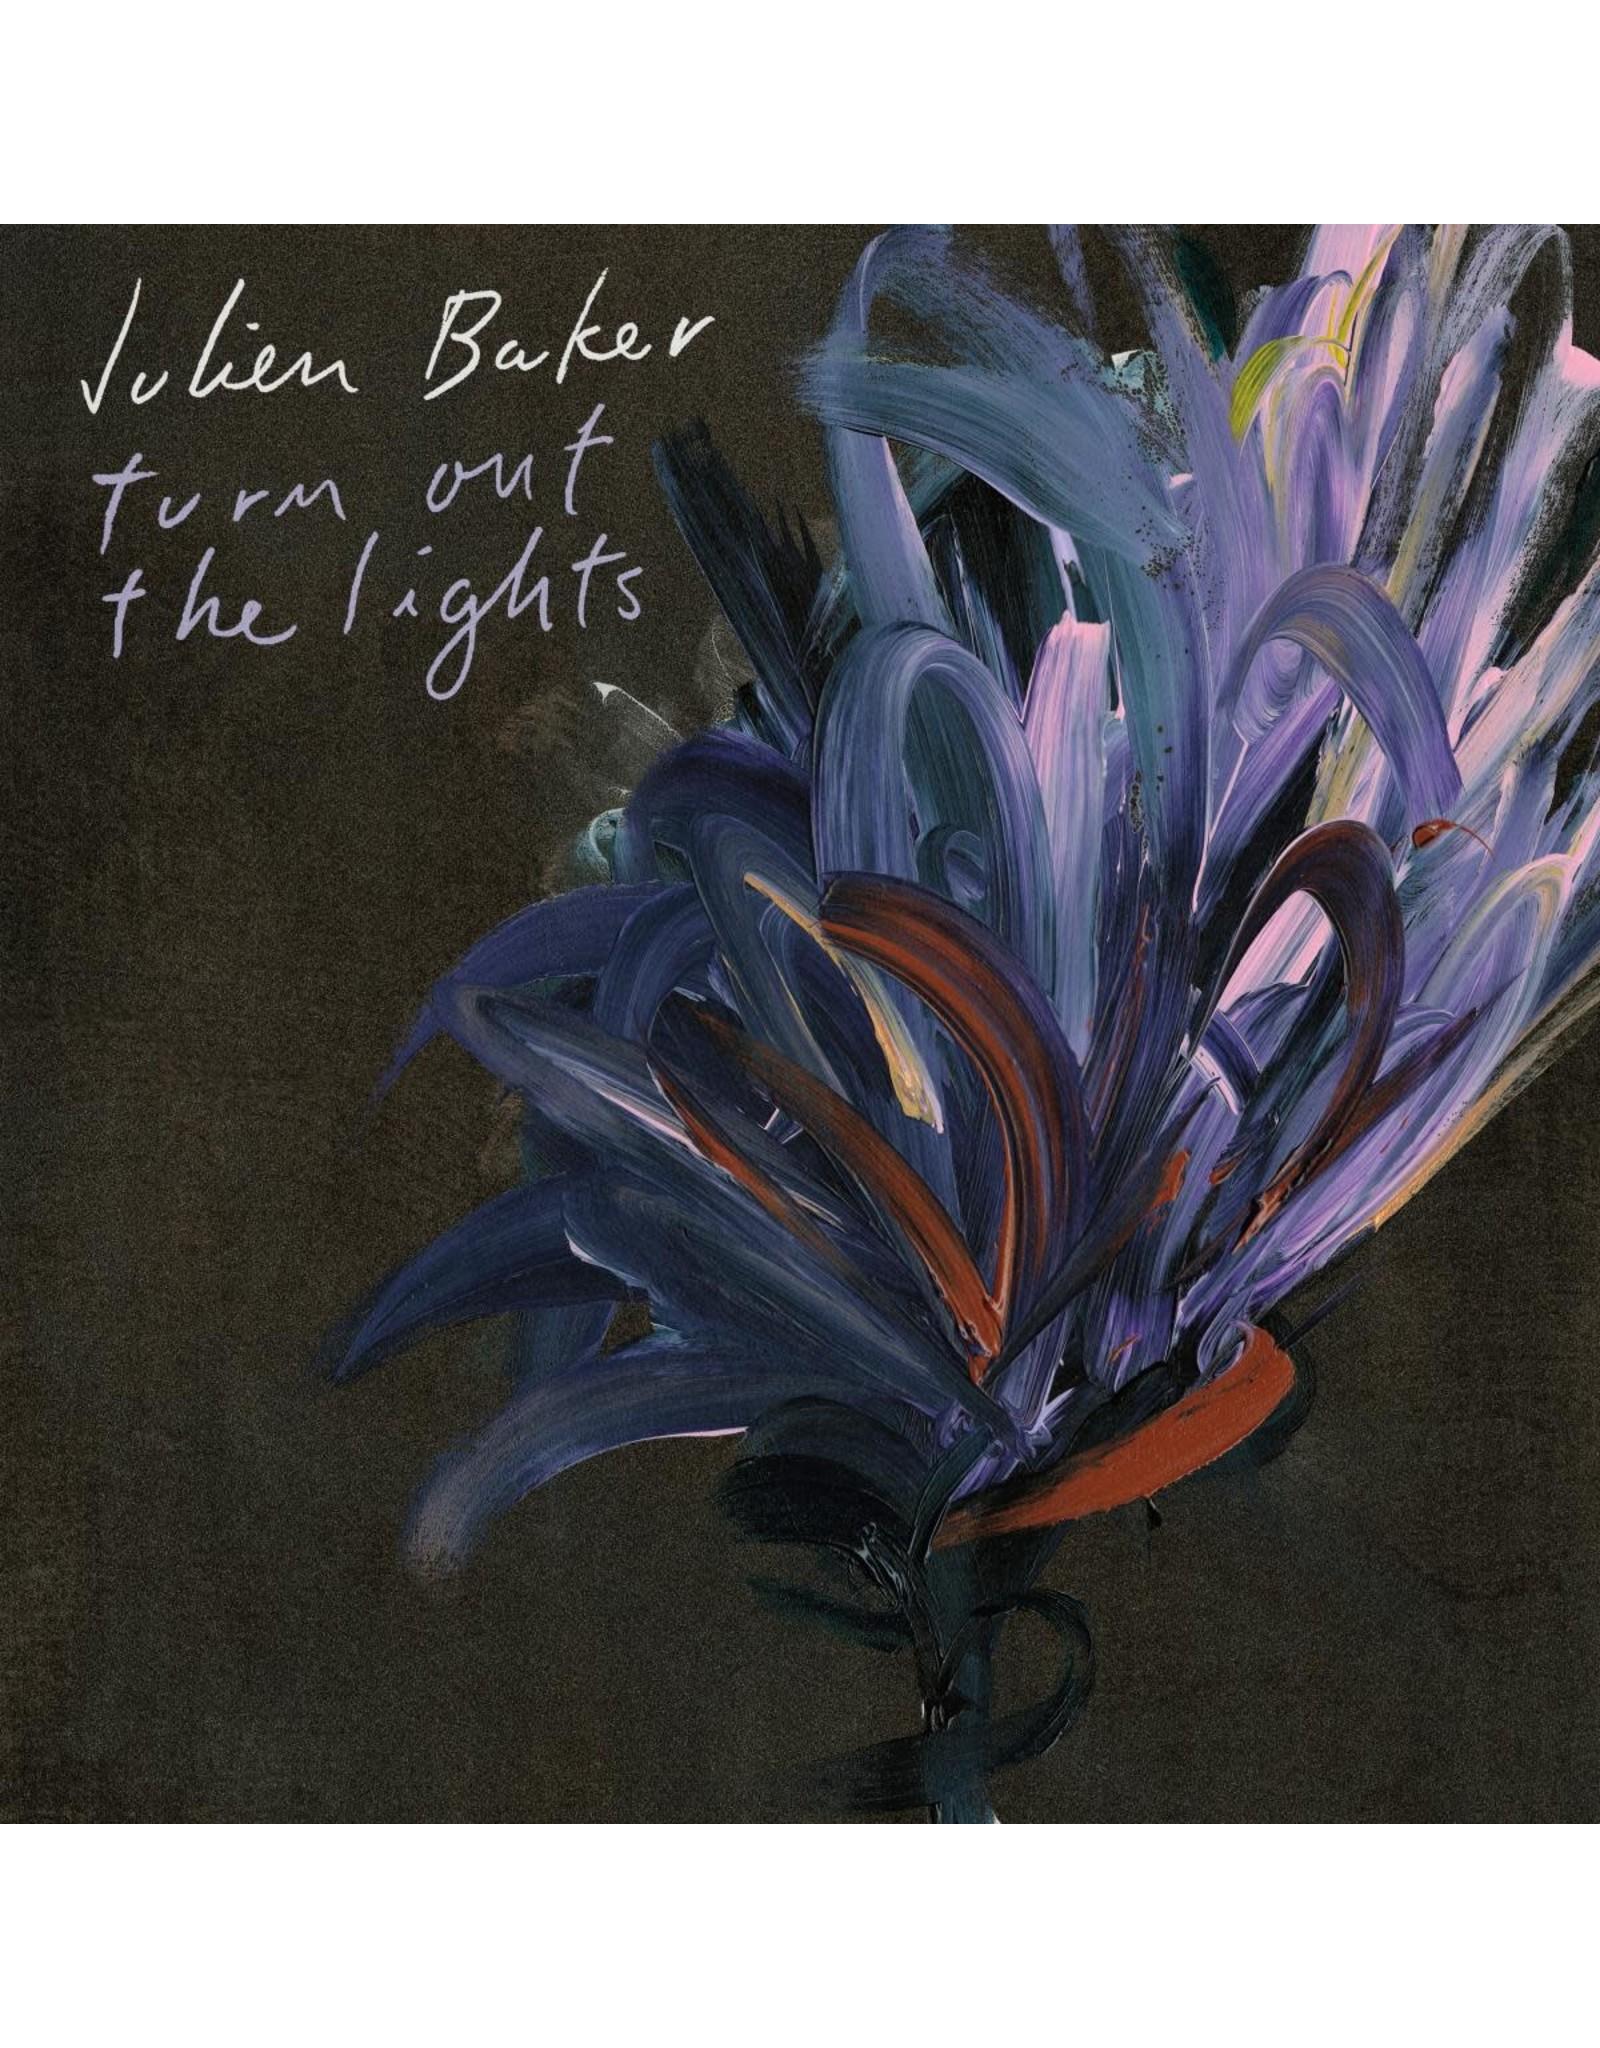 New Vinyl Julien Baker - Turn Out The Lights LP